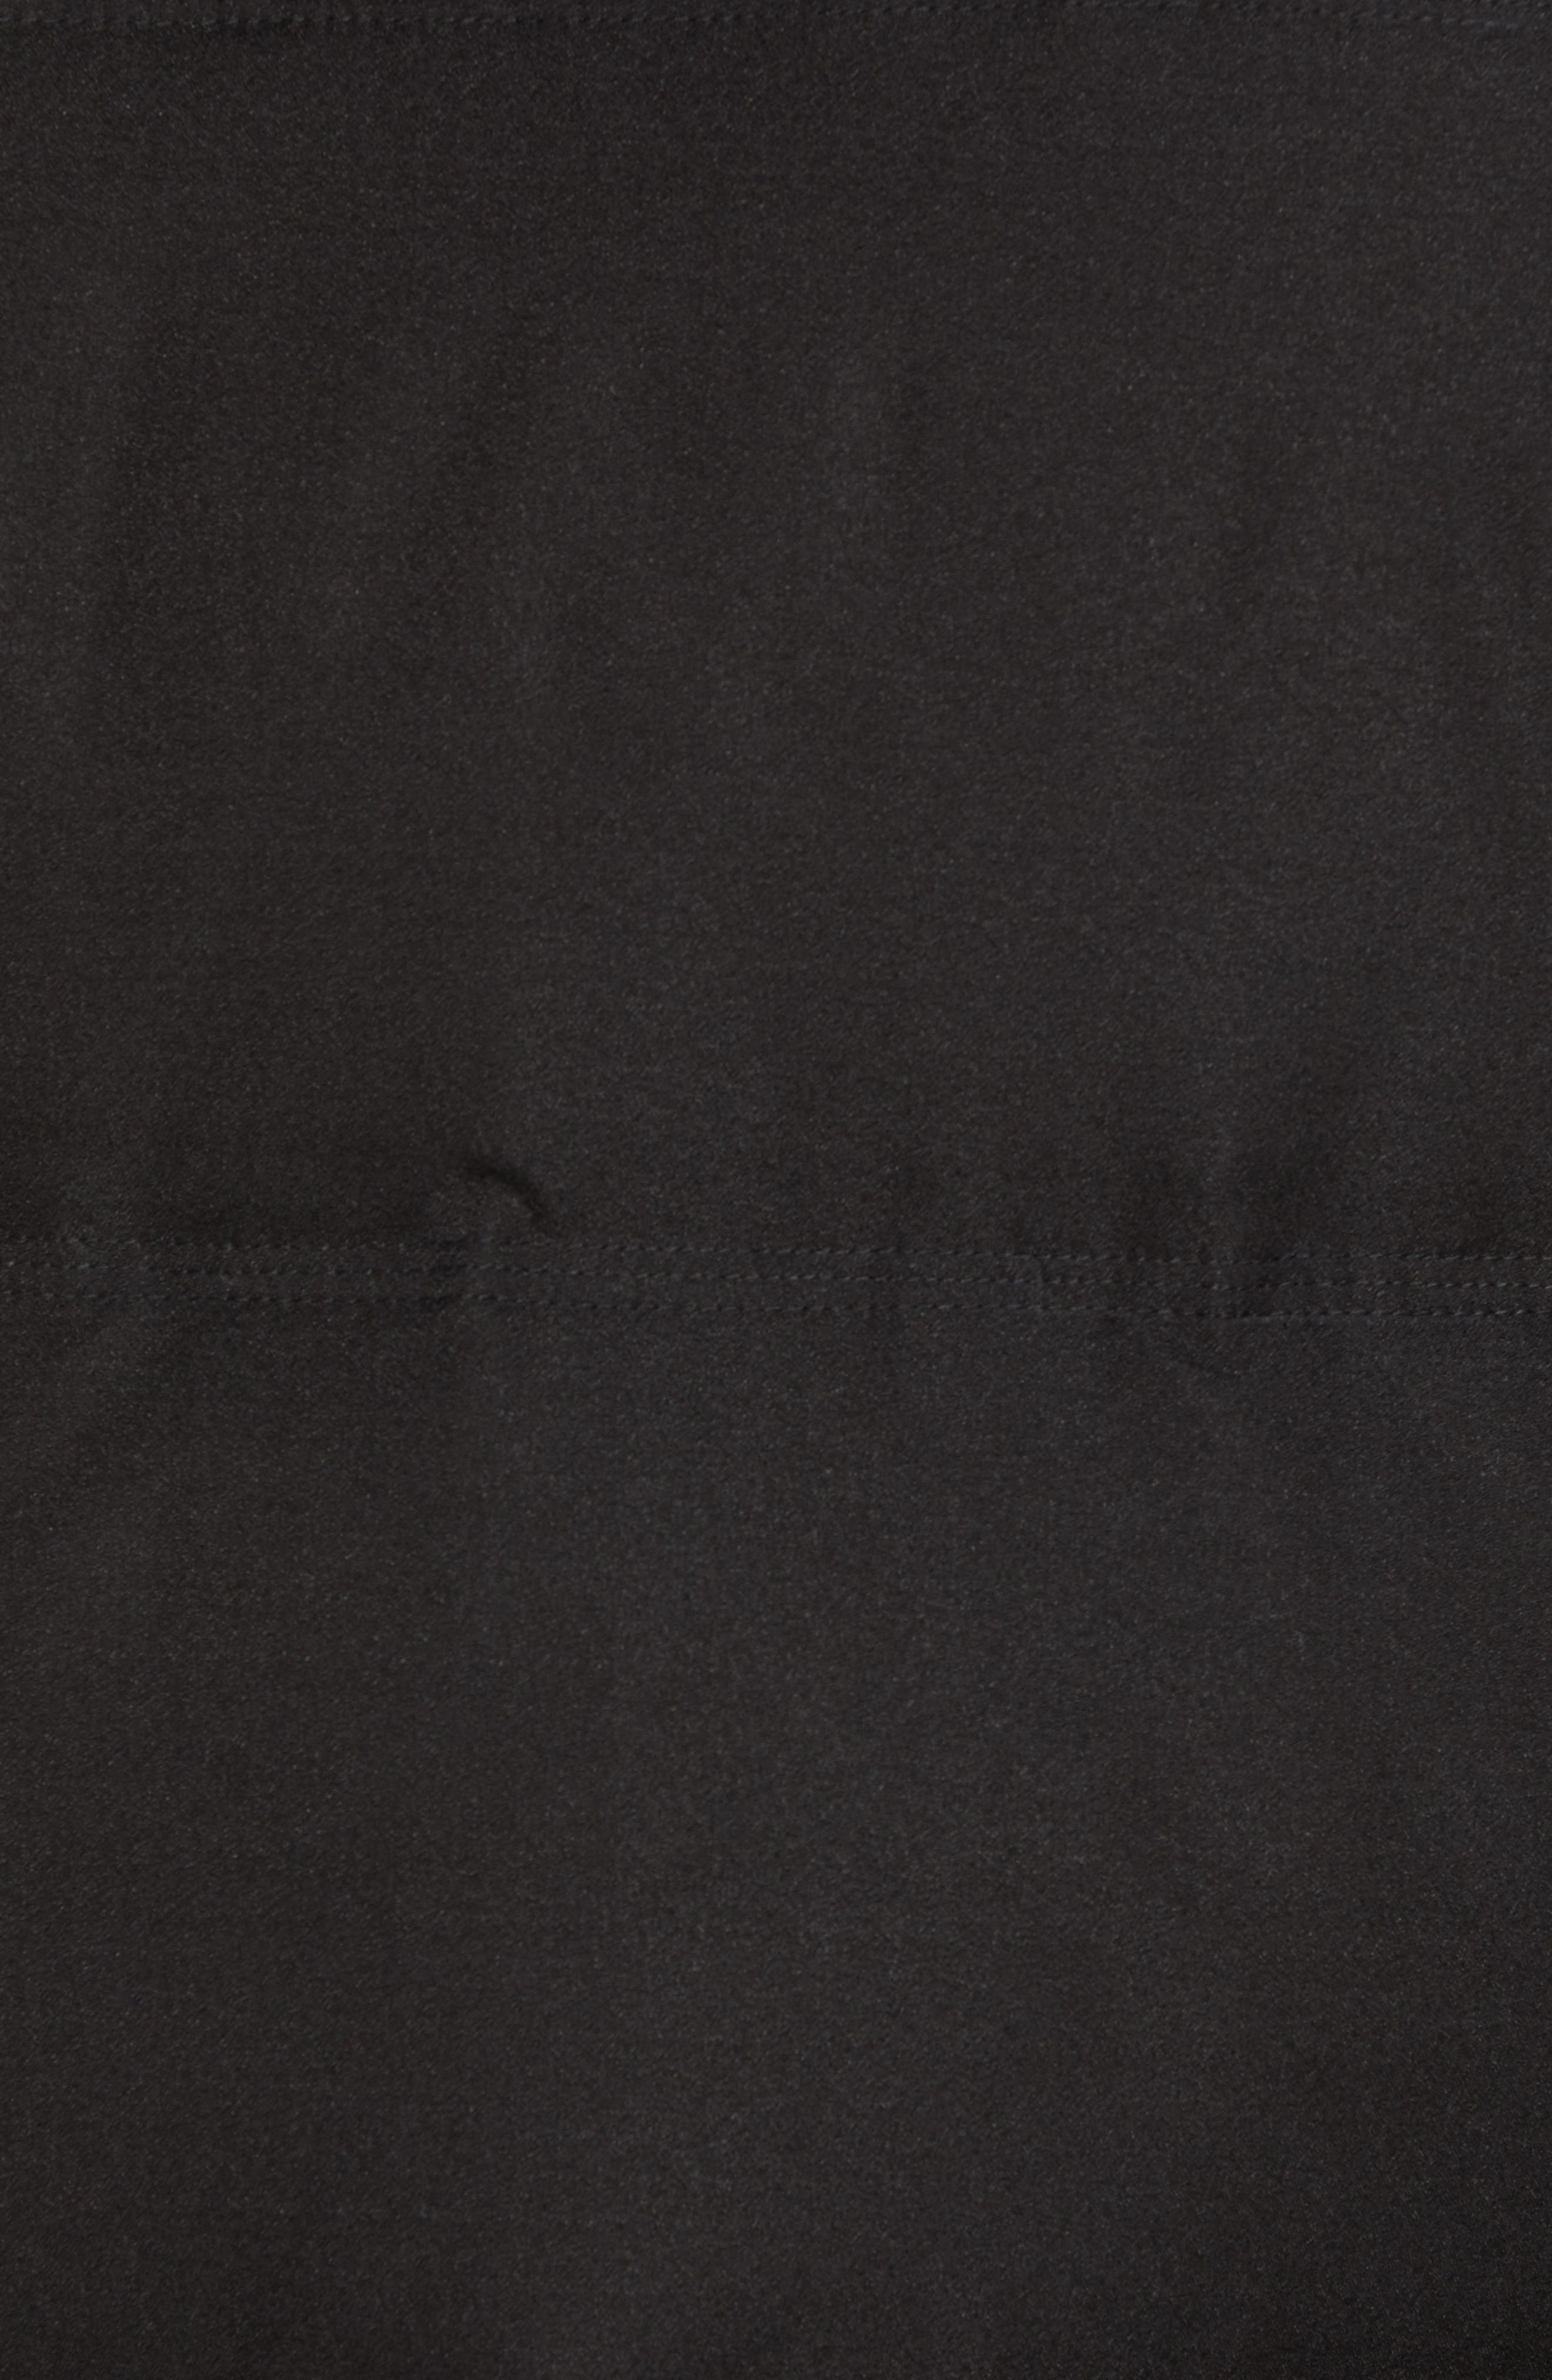 Bryant Genuine Rabbit Fur Trim Down Jacket,                             Alternate thumbnail 7, color,                             BLACK